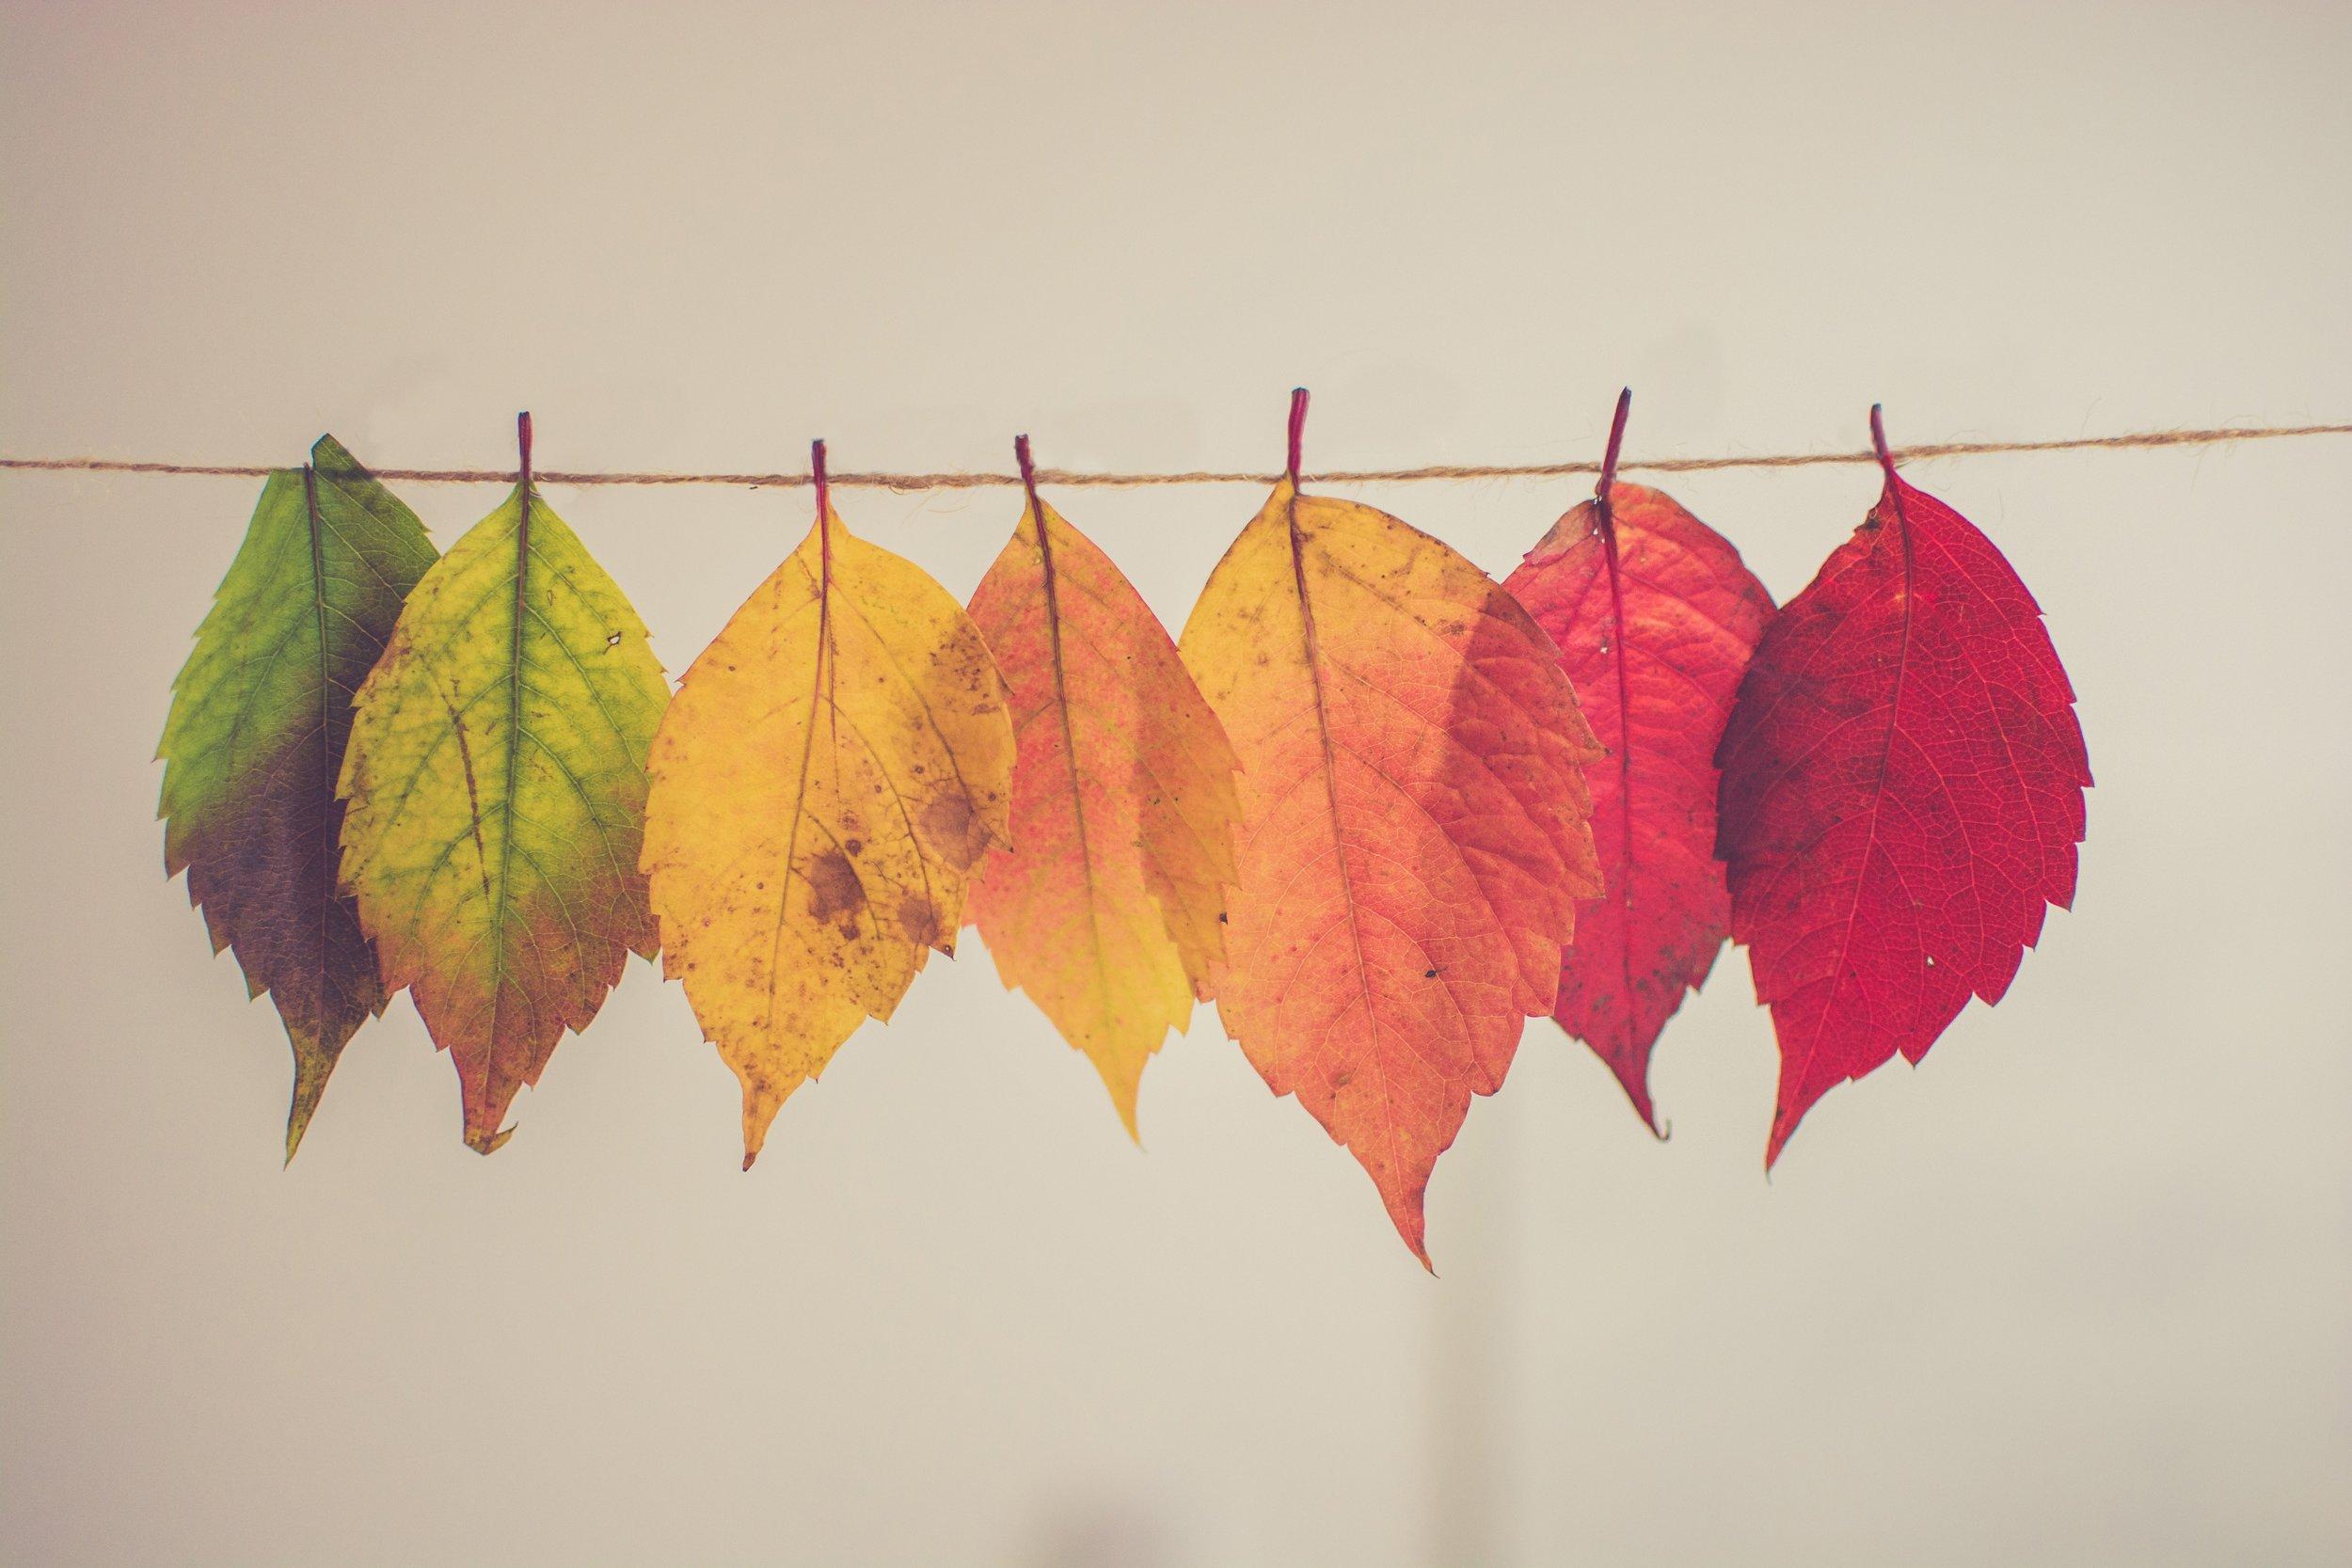 coloredleaveshanging.jpg